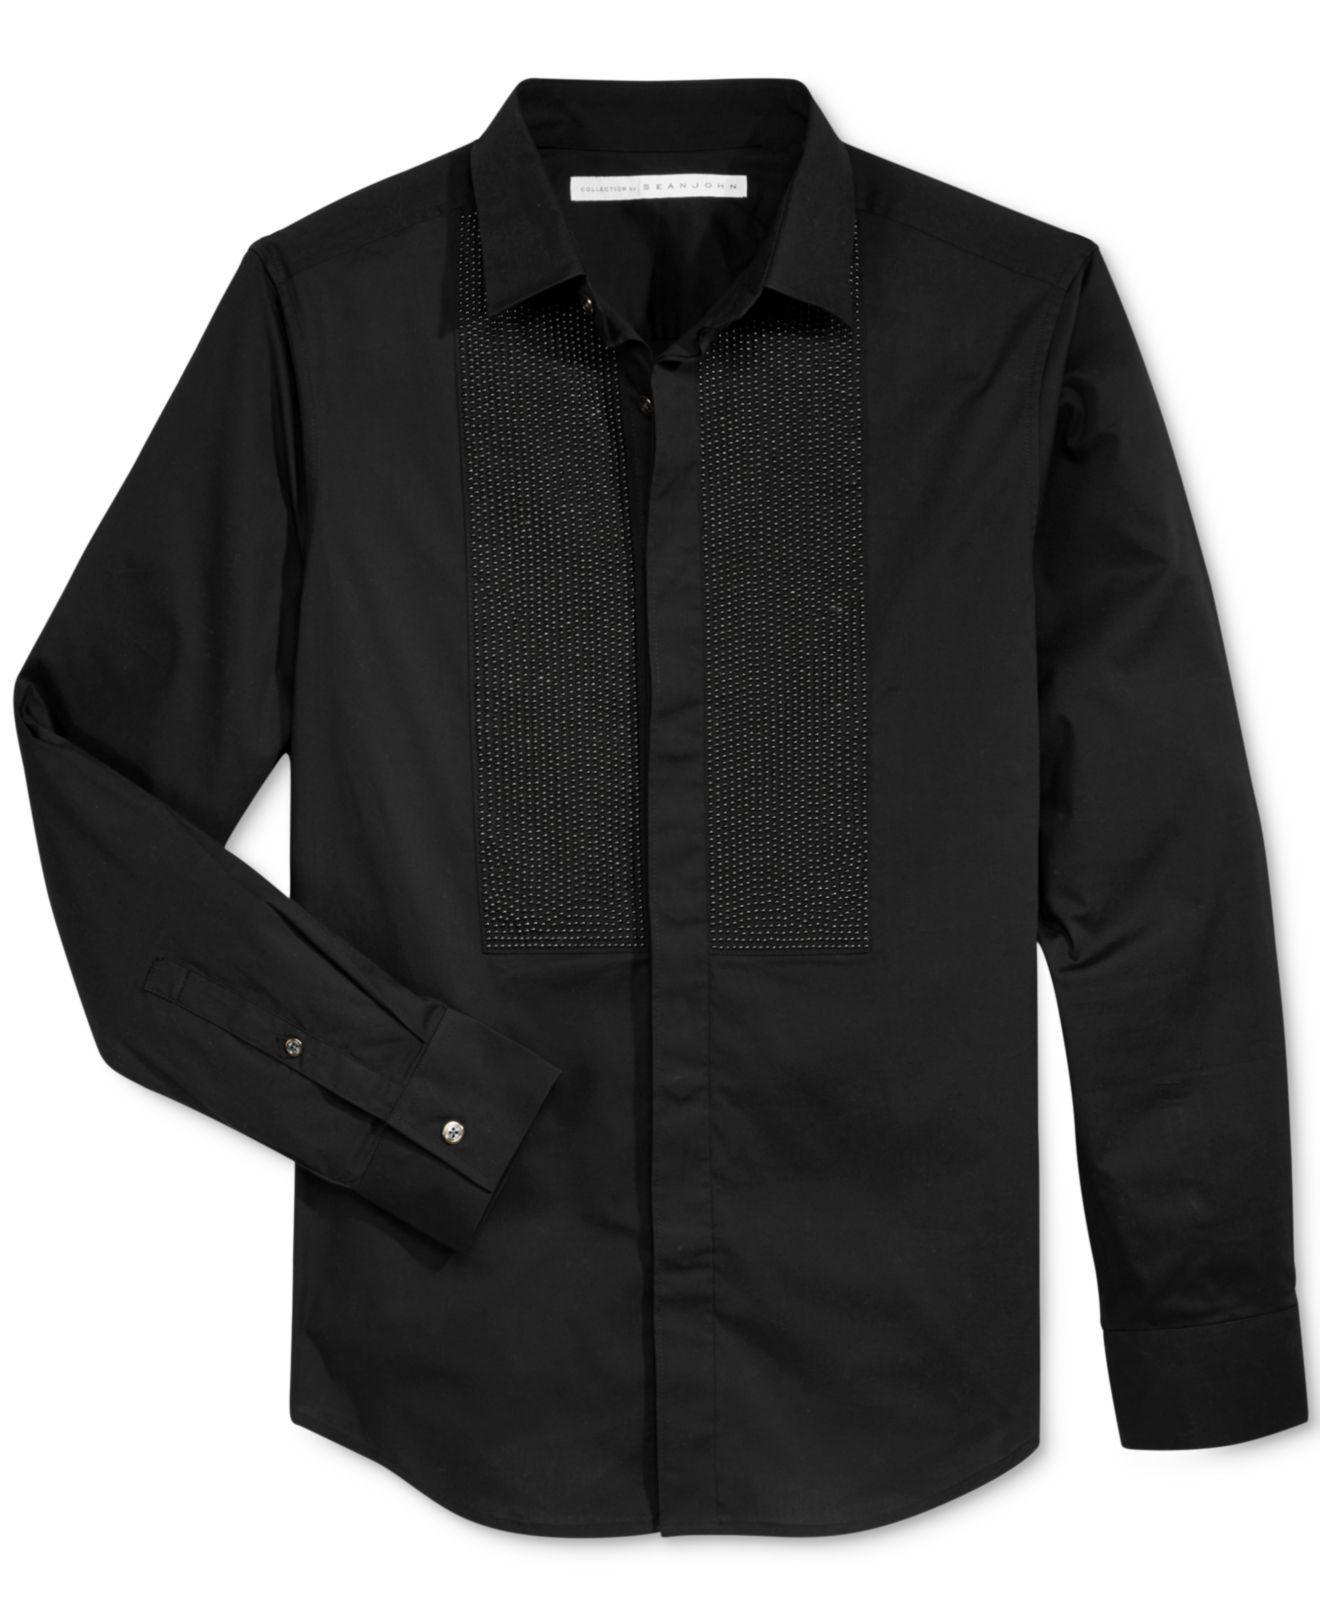 Lyst sean john men 39 s studded shirt in black for men for Sean john t shirts for mens